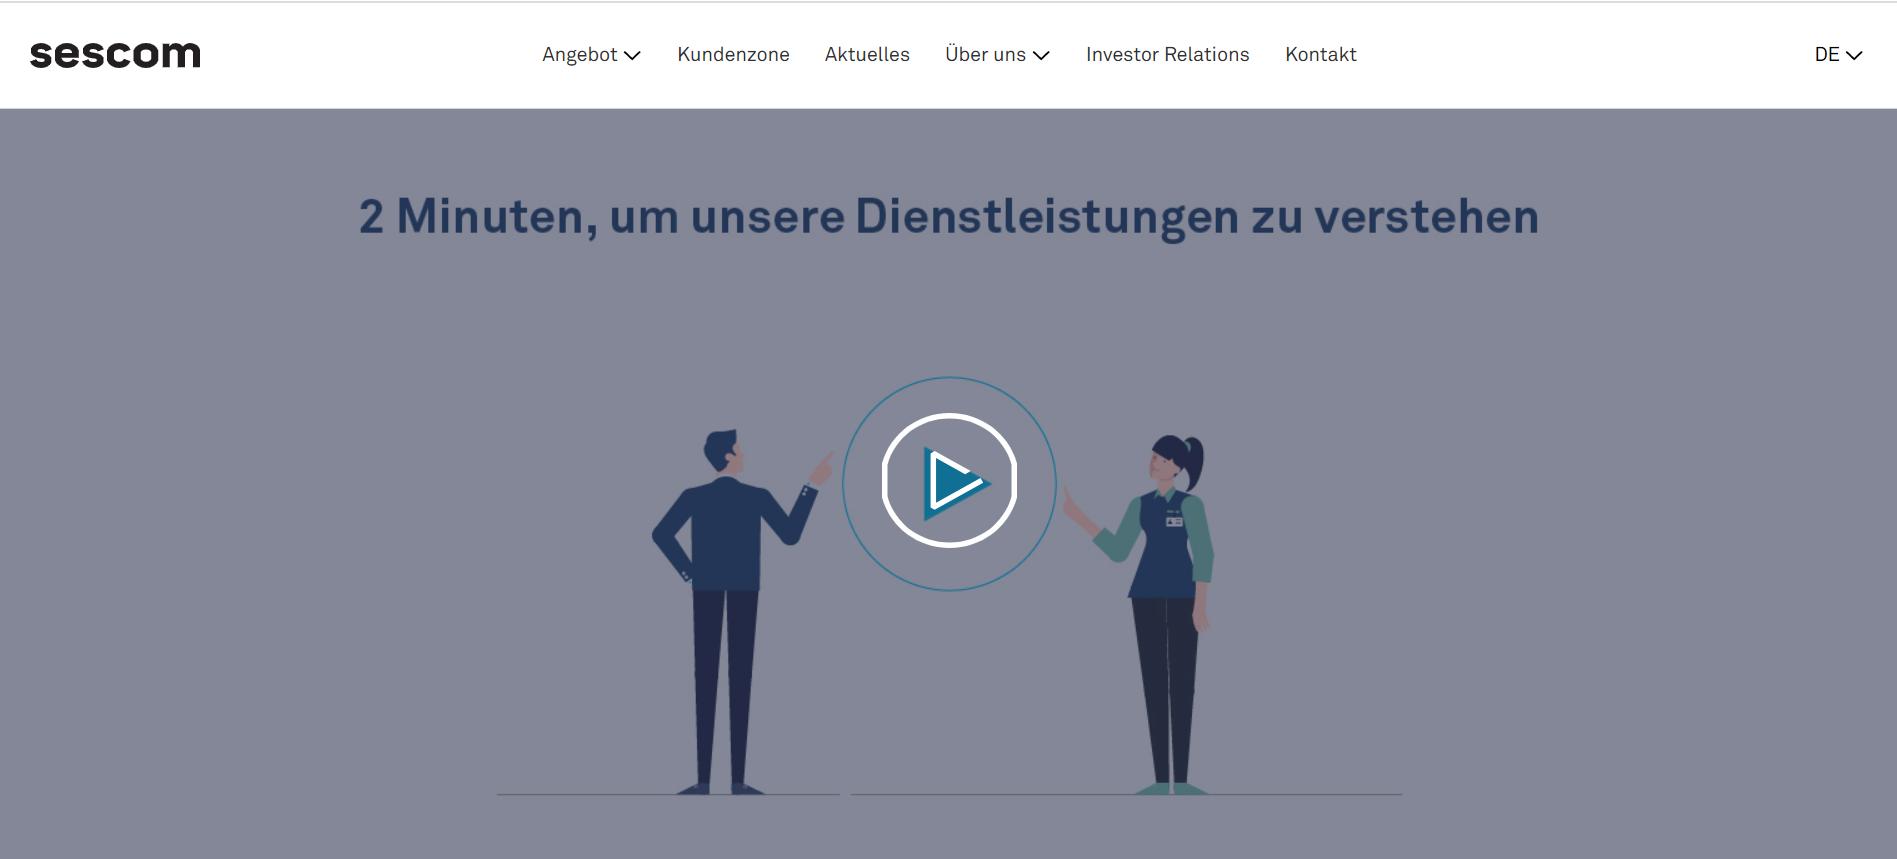 Zrzut ekranu Animacja Sescom DE